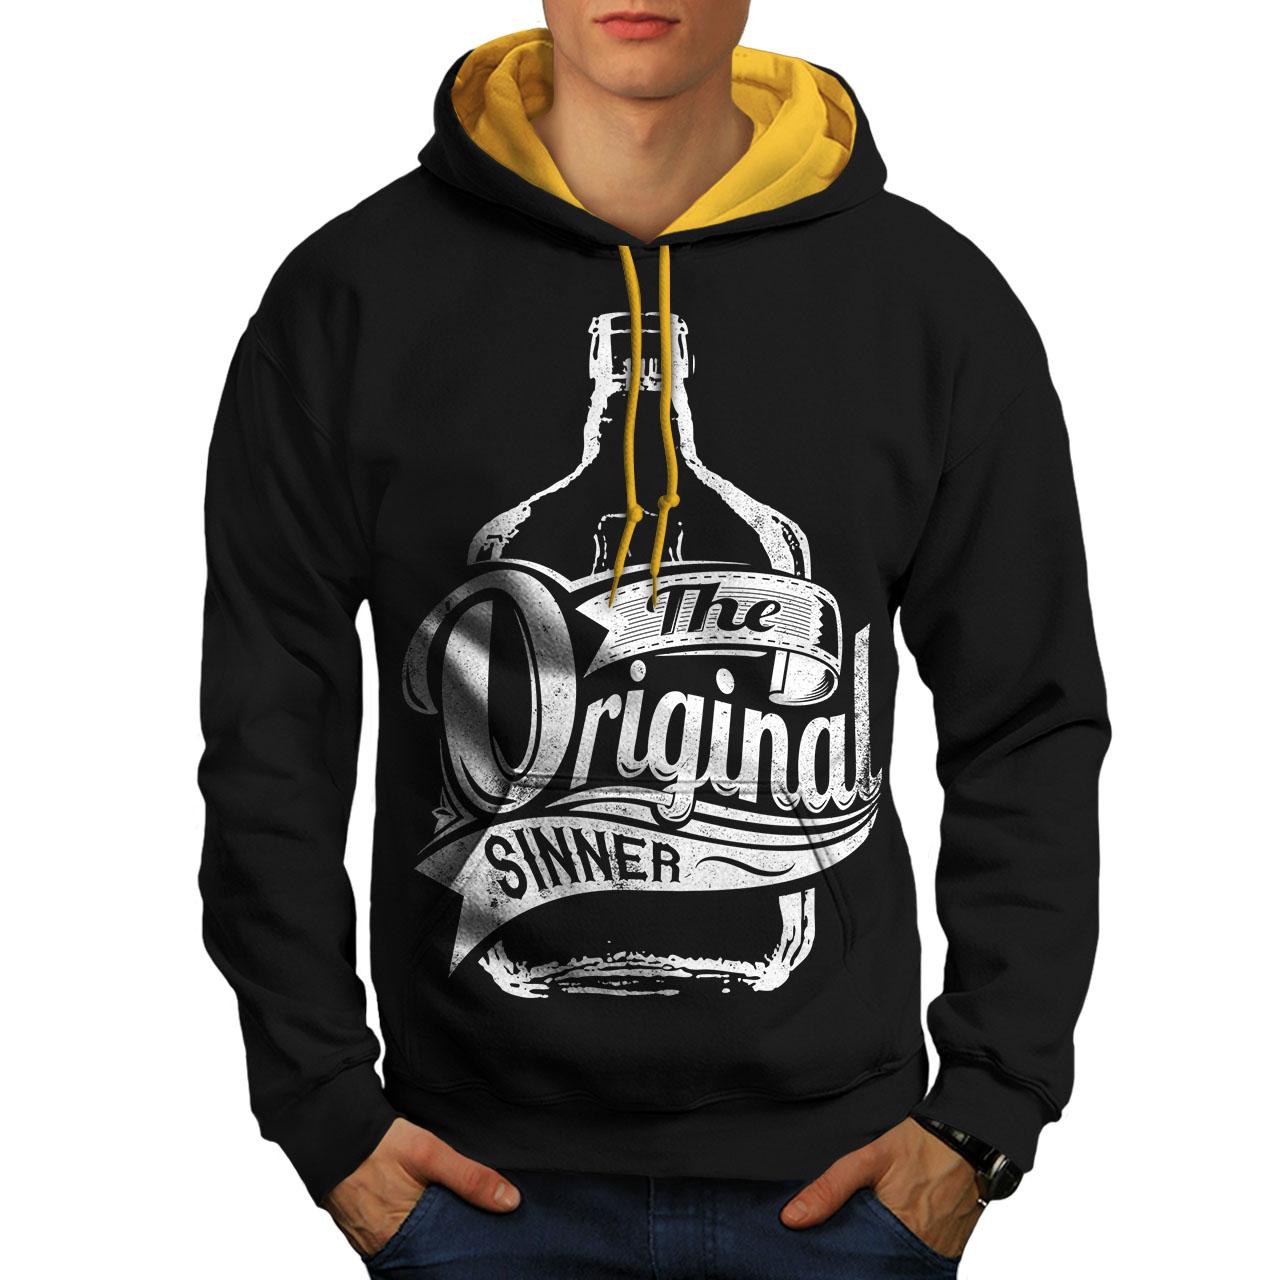 wellcoda Unique Sinner Funny Mens Sweatshirt Rum Casual Jumper